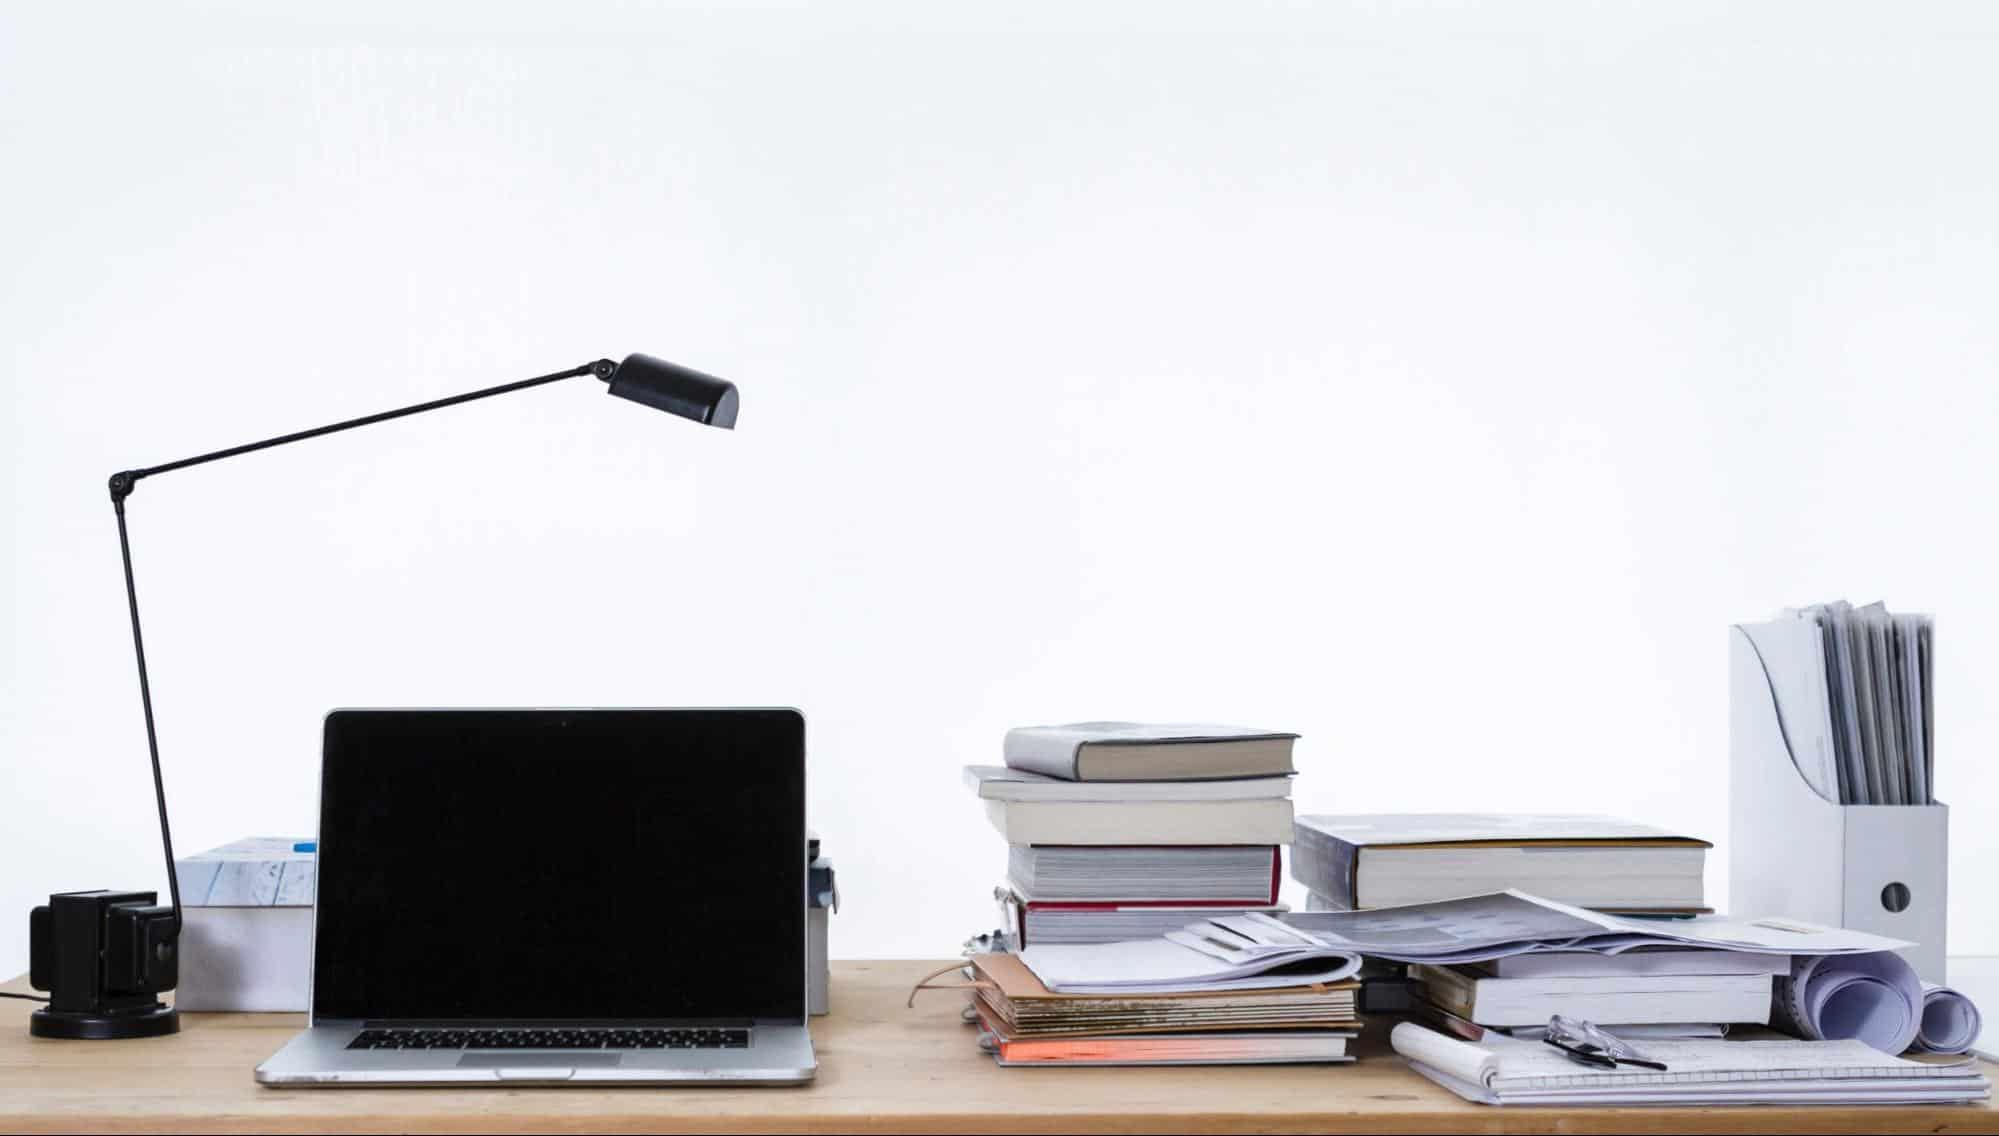 mobiliario-para-un-espacio-de-home-office